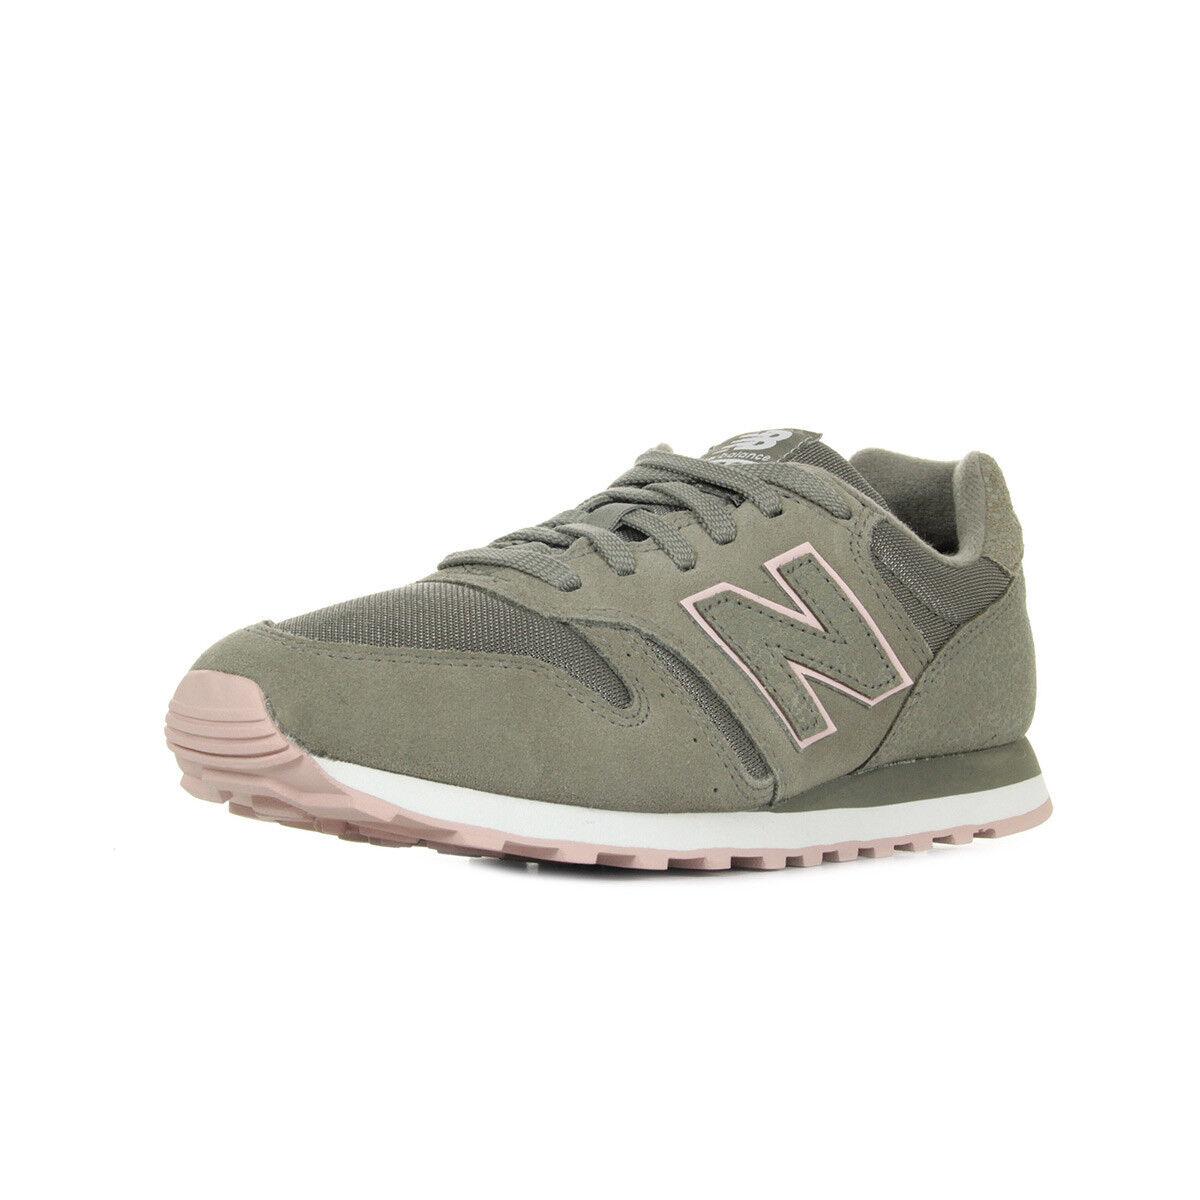 Baskets Femme Kaki Balance 373 Taille New Military Chaussures Vert gwTUqpp